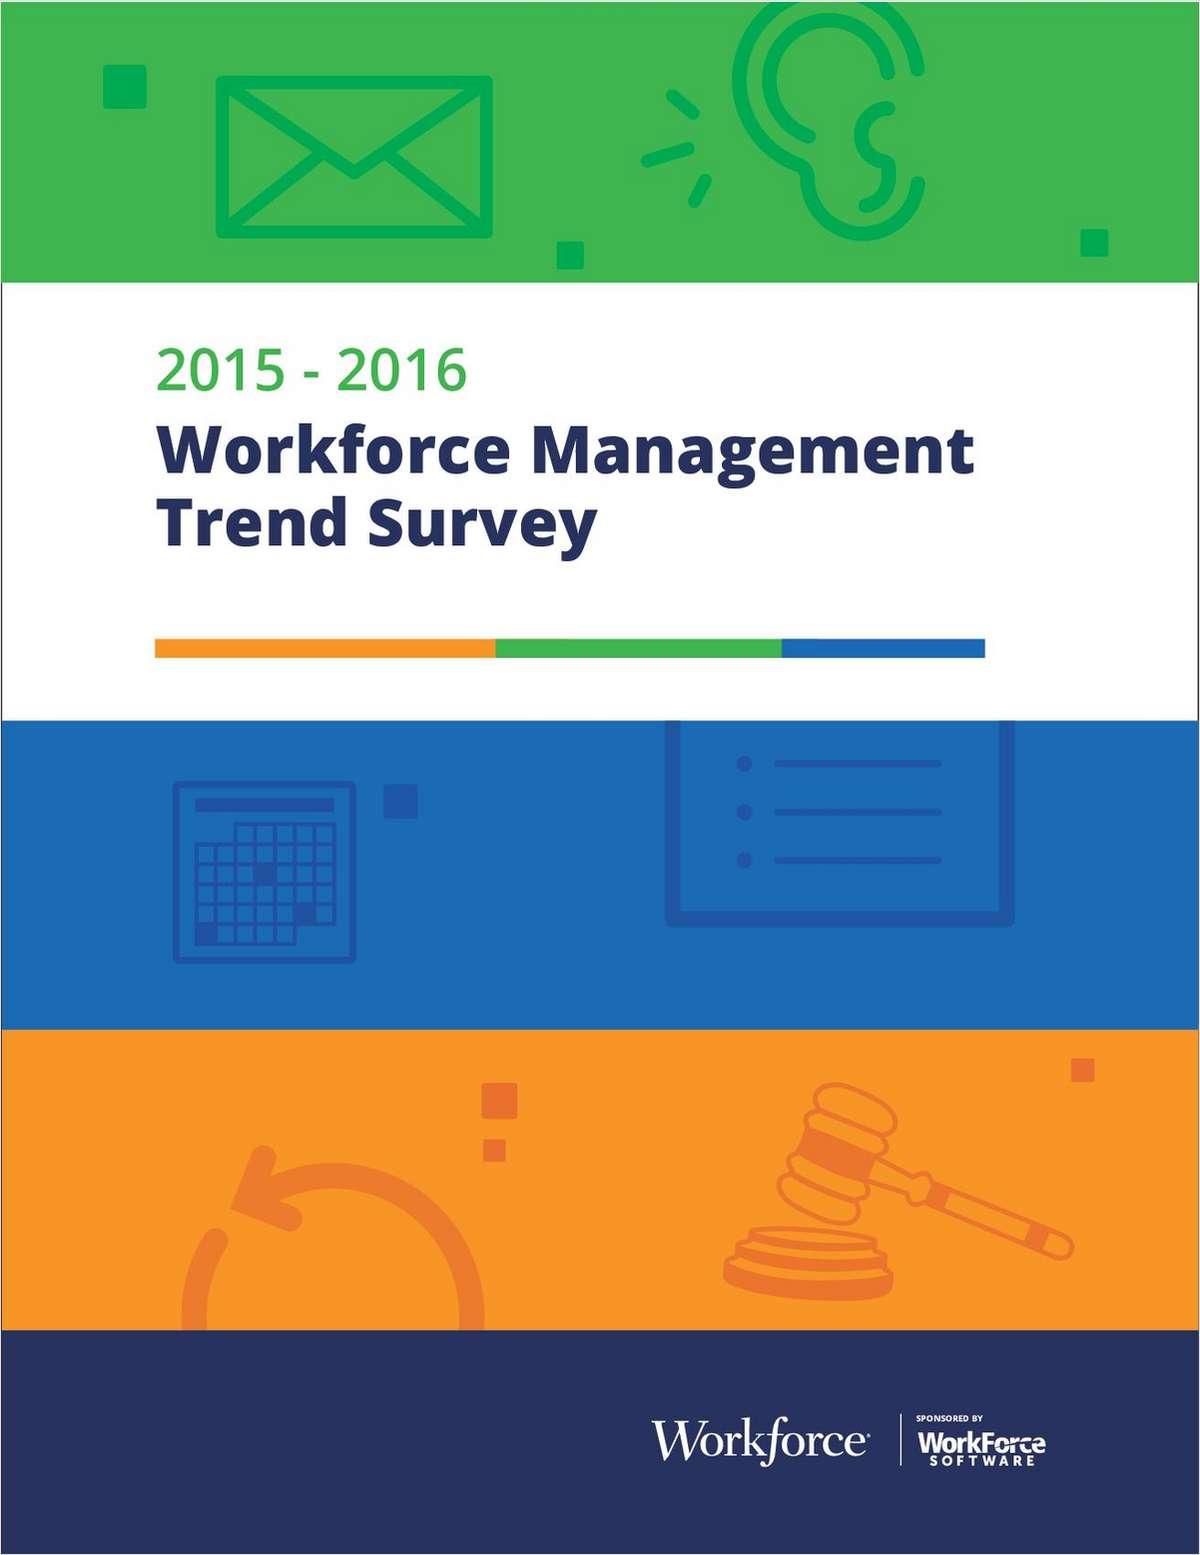 Workforce Management Trend Survey 2015-2016